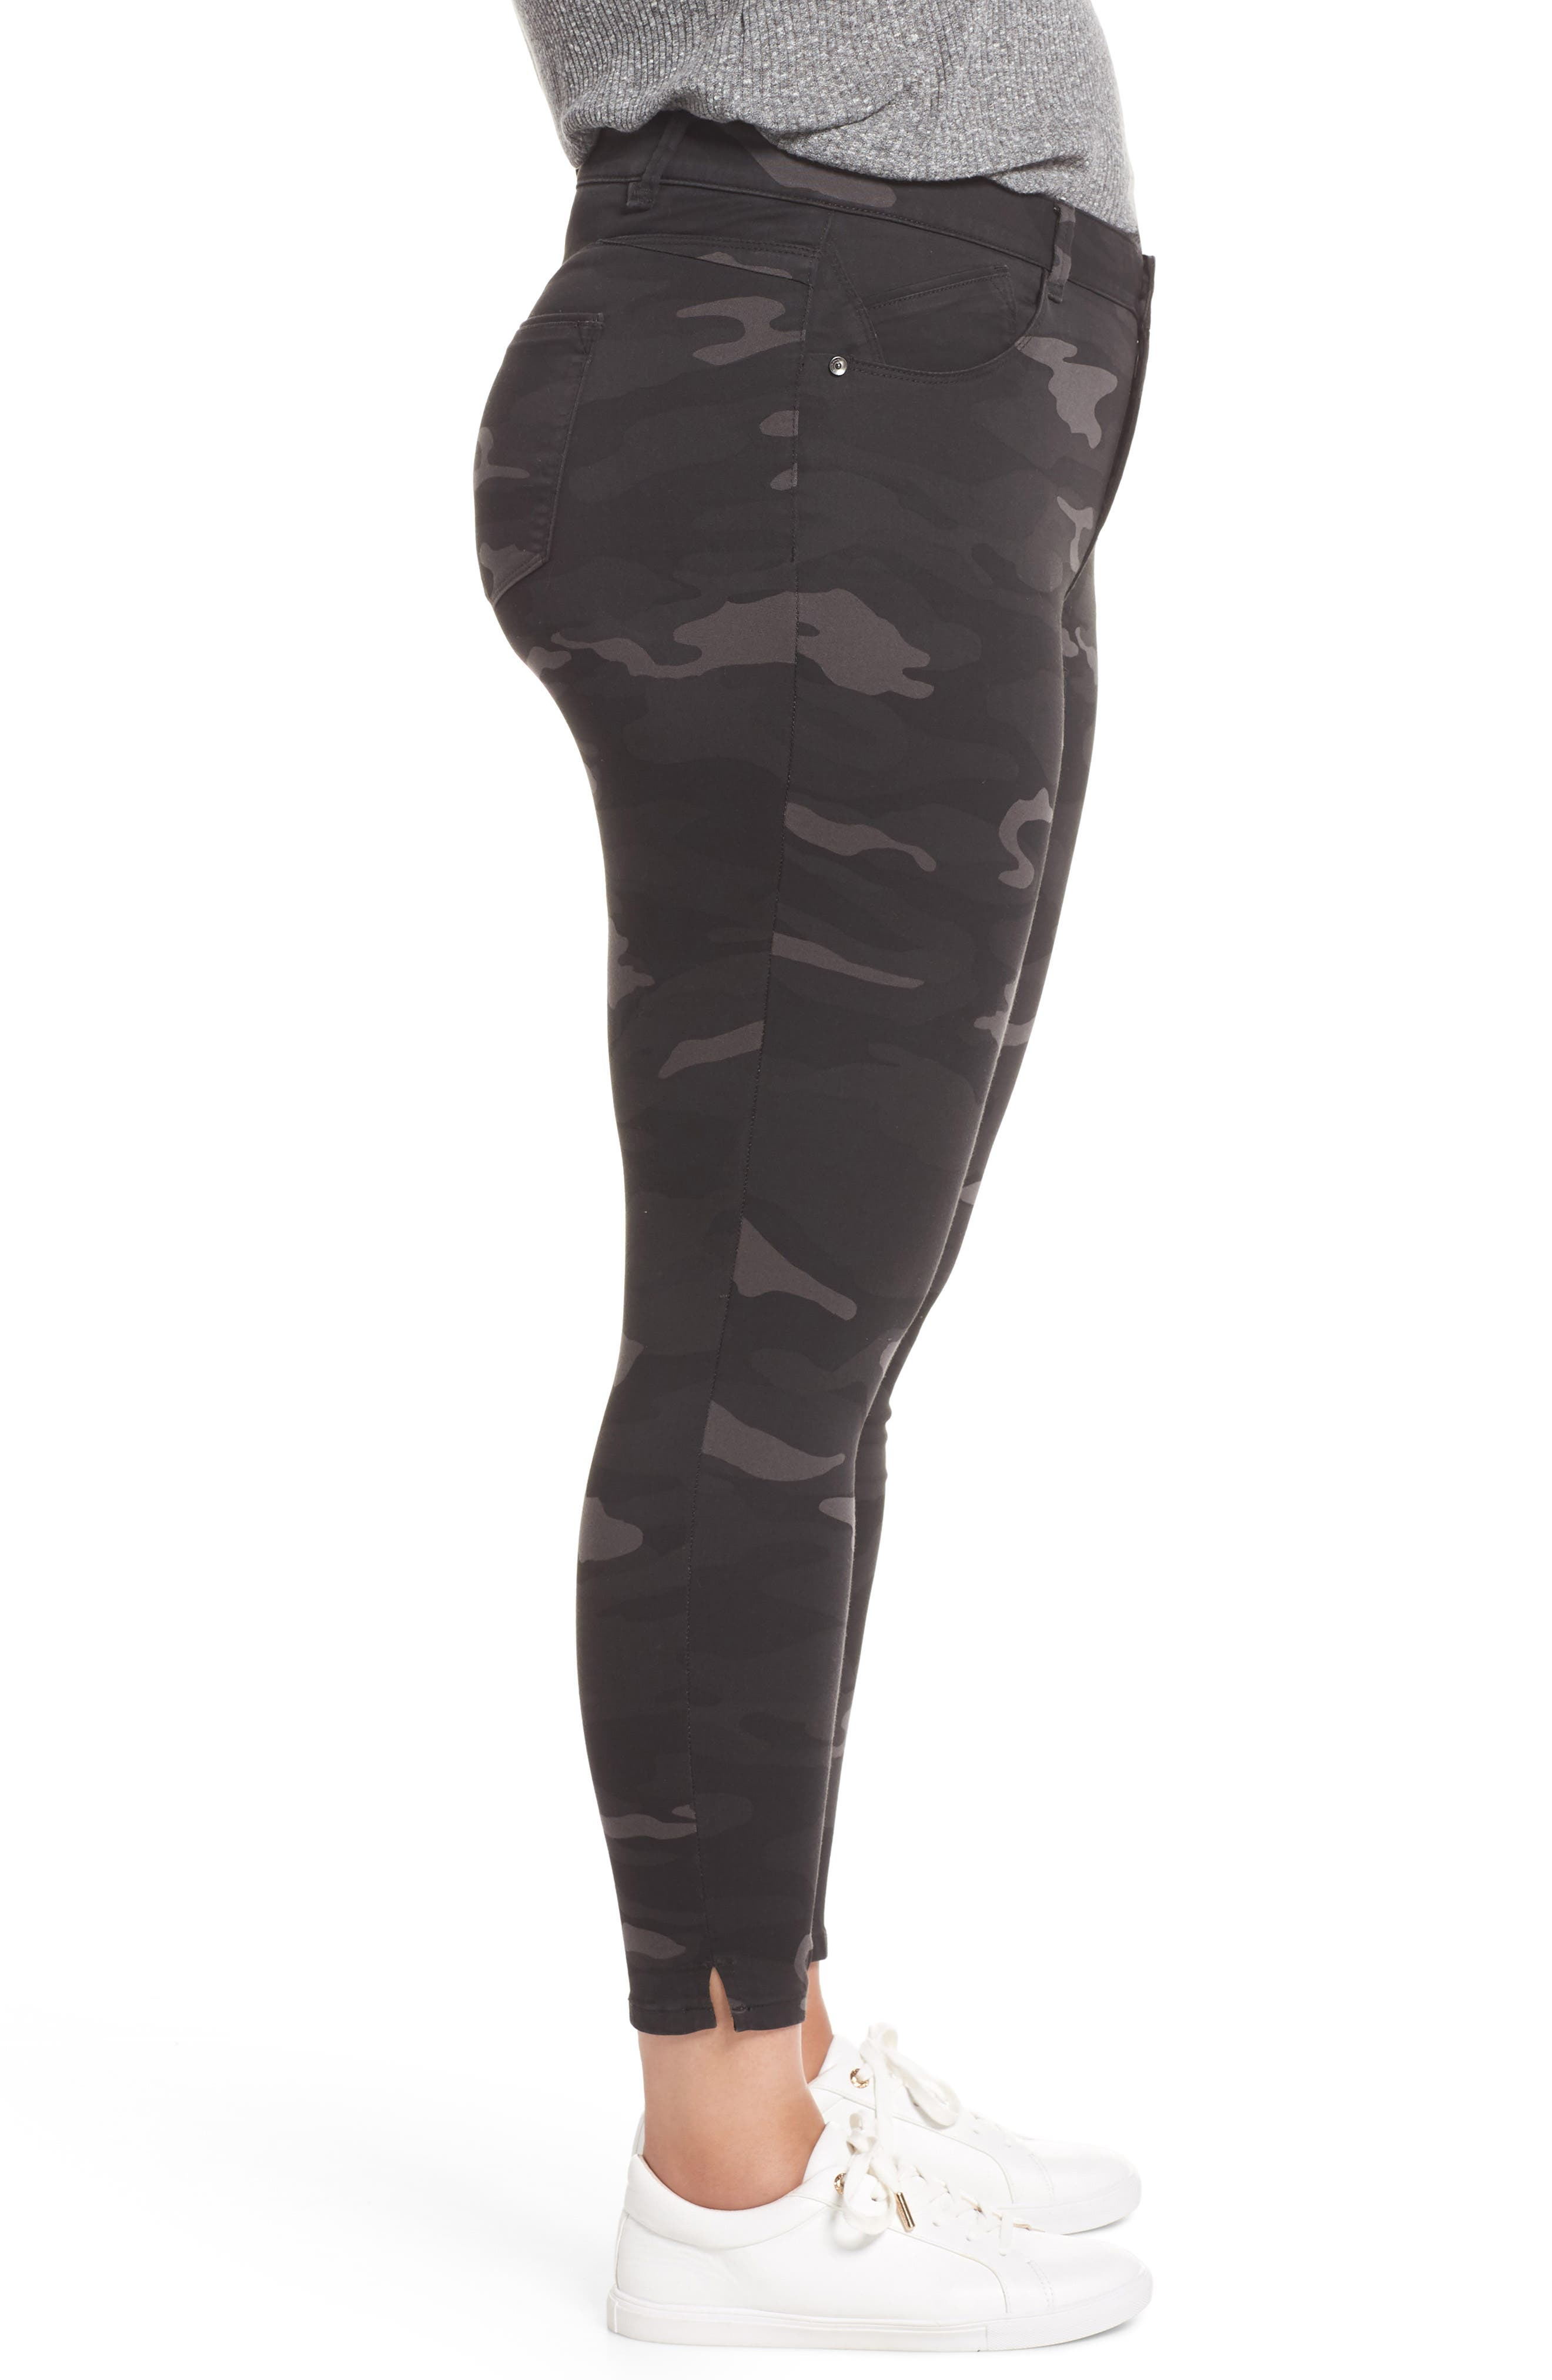 Ab-Solution Ankle Skimmer Jeans,                             Alternate thumbnail 3, color,                             BLACK/ CAMO